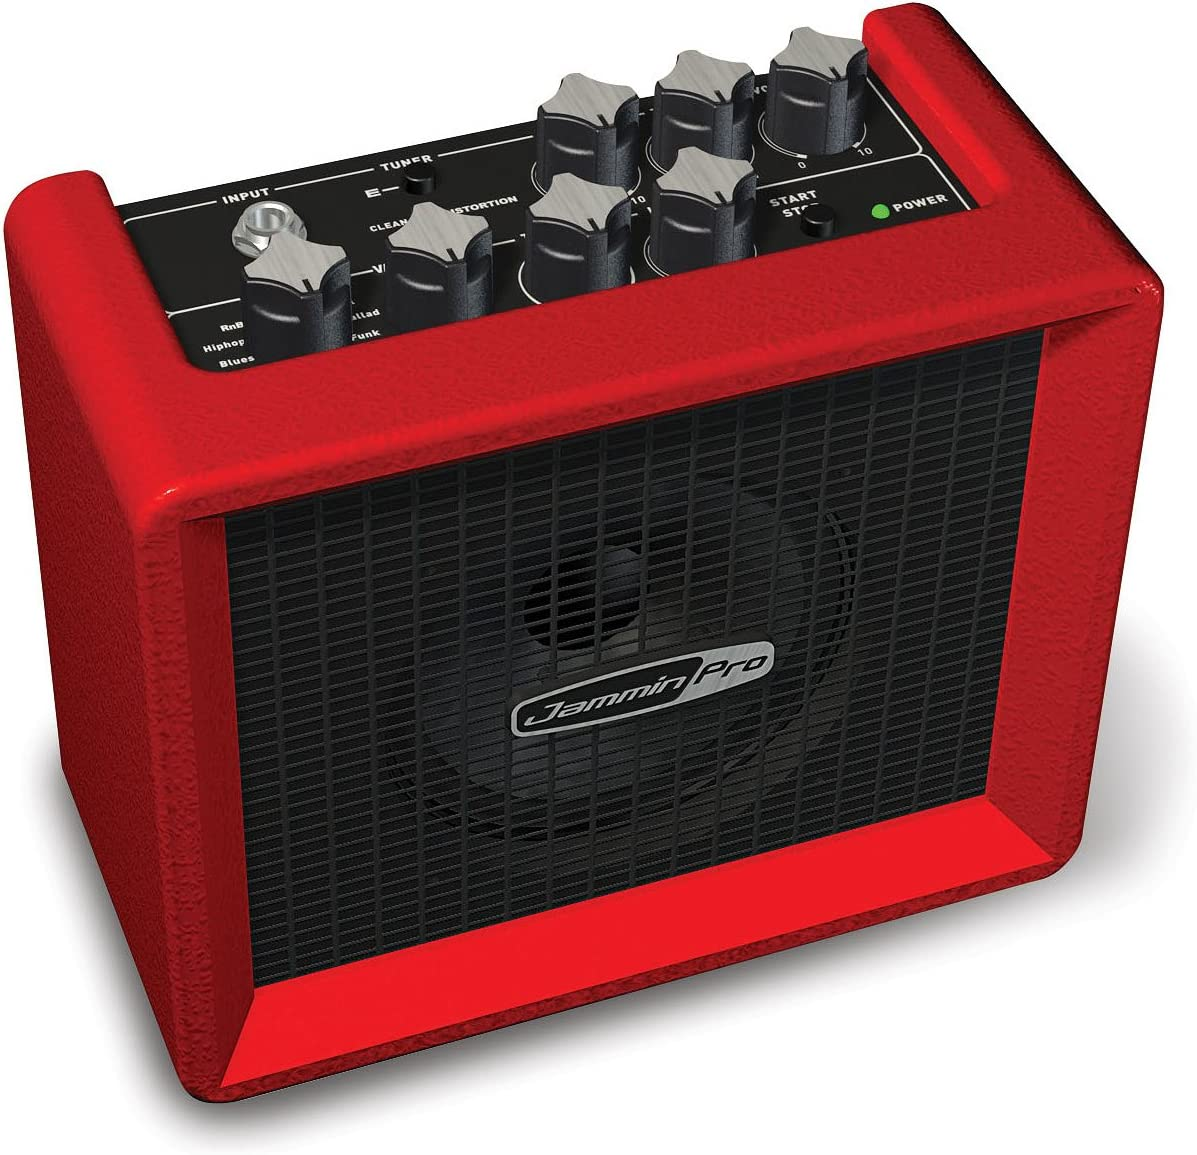 Jammin Pro MINIJAM 30-Watt Amplifier Online limited product Power - Outlet ☆ Free Shipping Channel